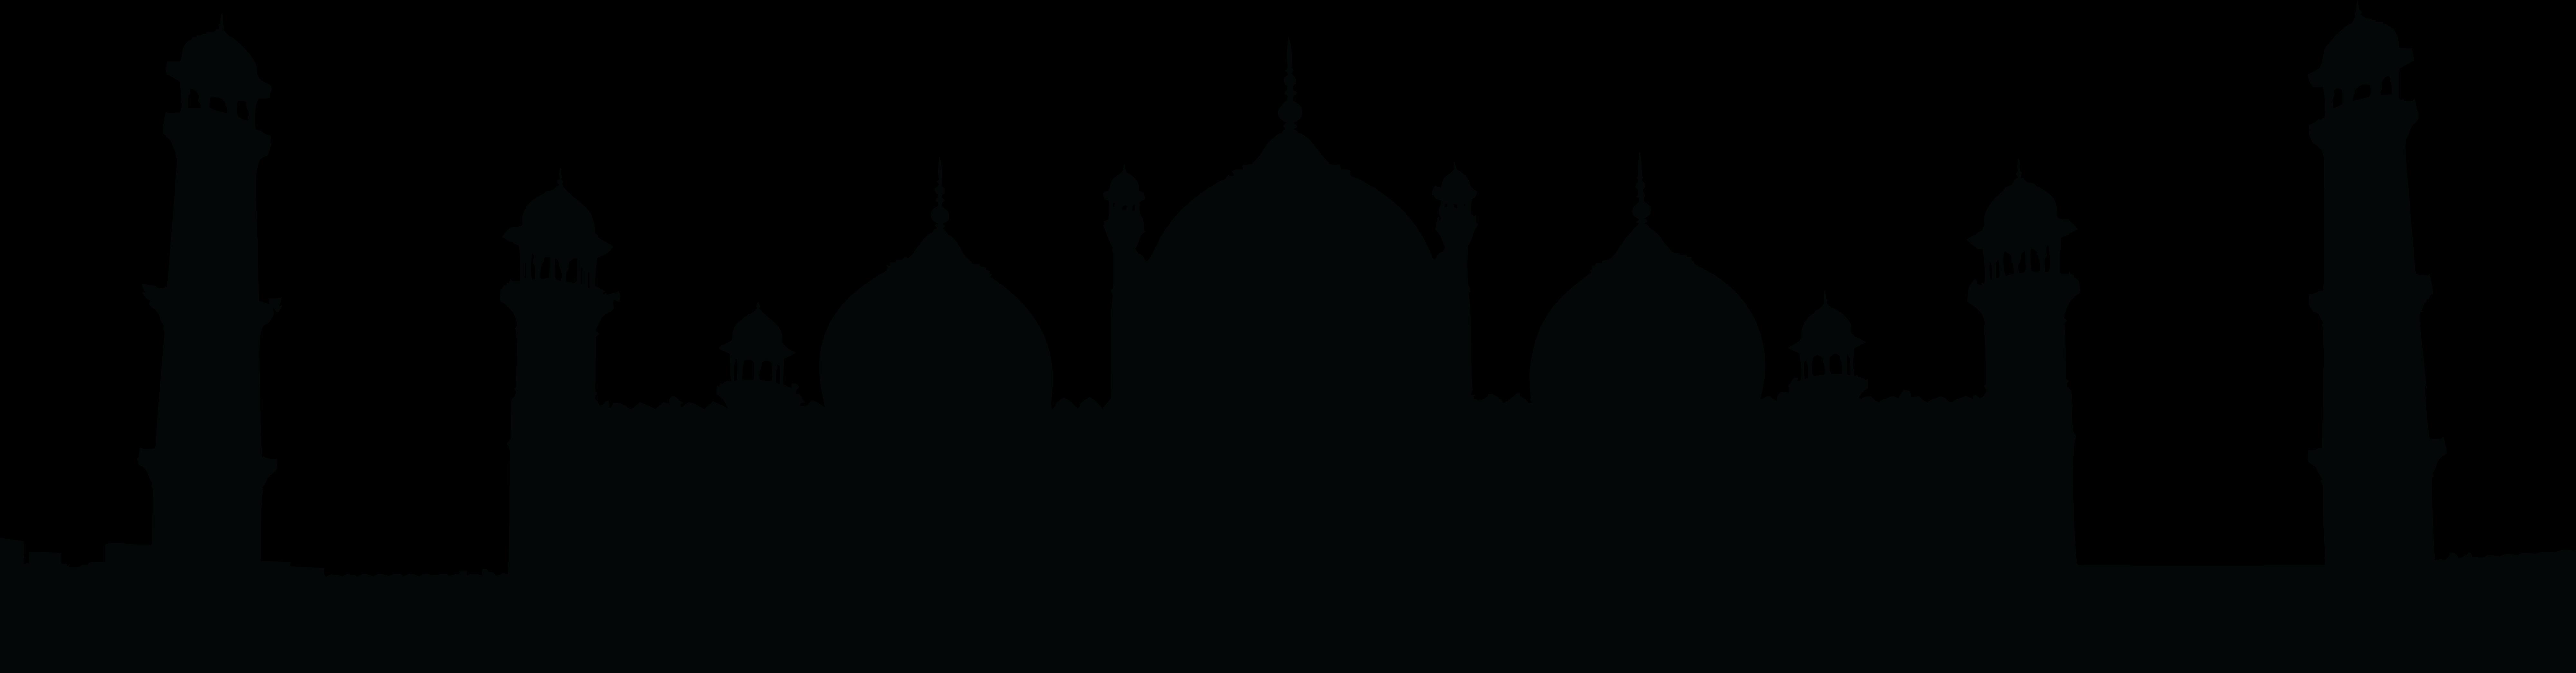 8000x2089 Free Clipart Of A Badshahi Mosque Lahore Pakistan Black And White